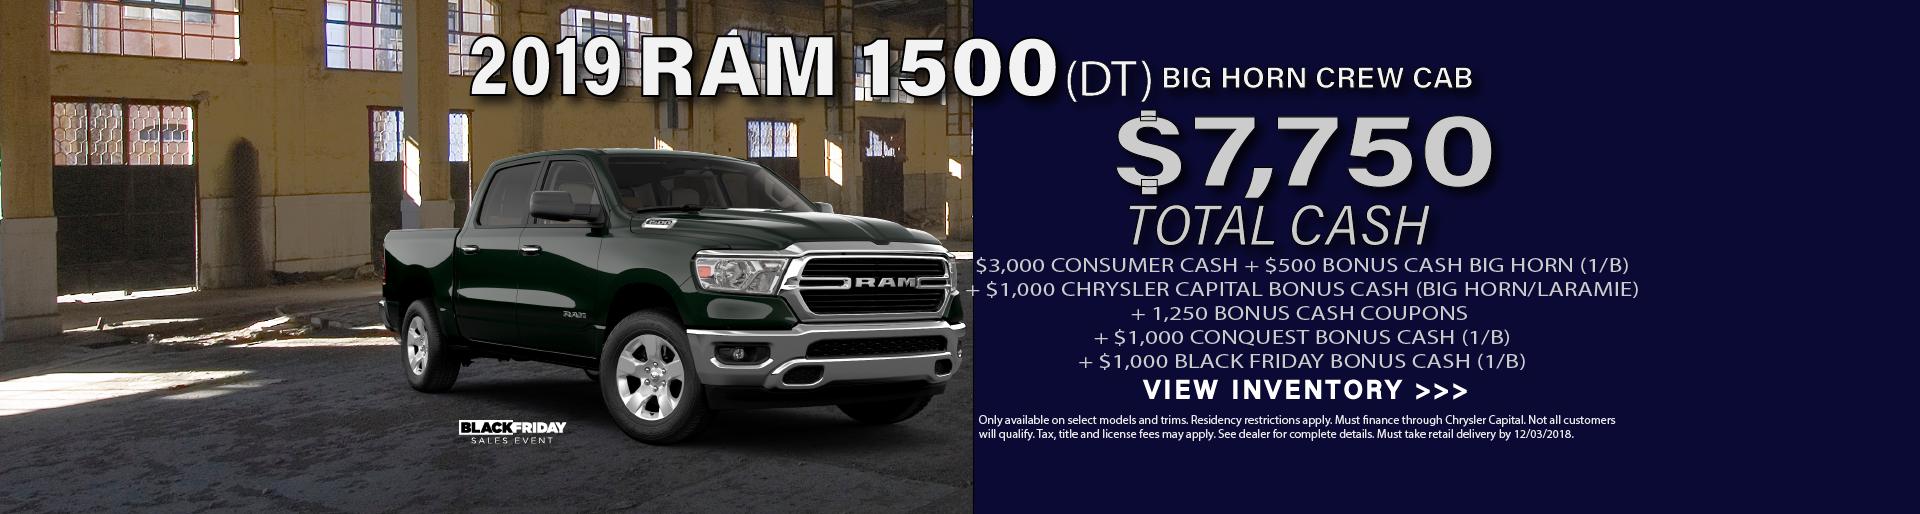 Sam Leman Morton Il >> Sam Leman Chrysler, Dodge, Jeep, Ram, FIAT Dealer in Morton, IL